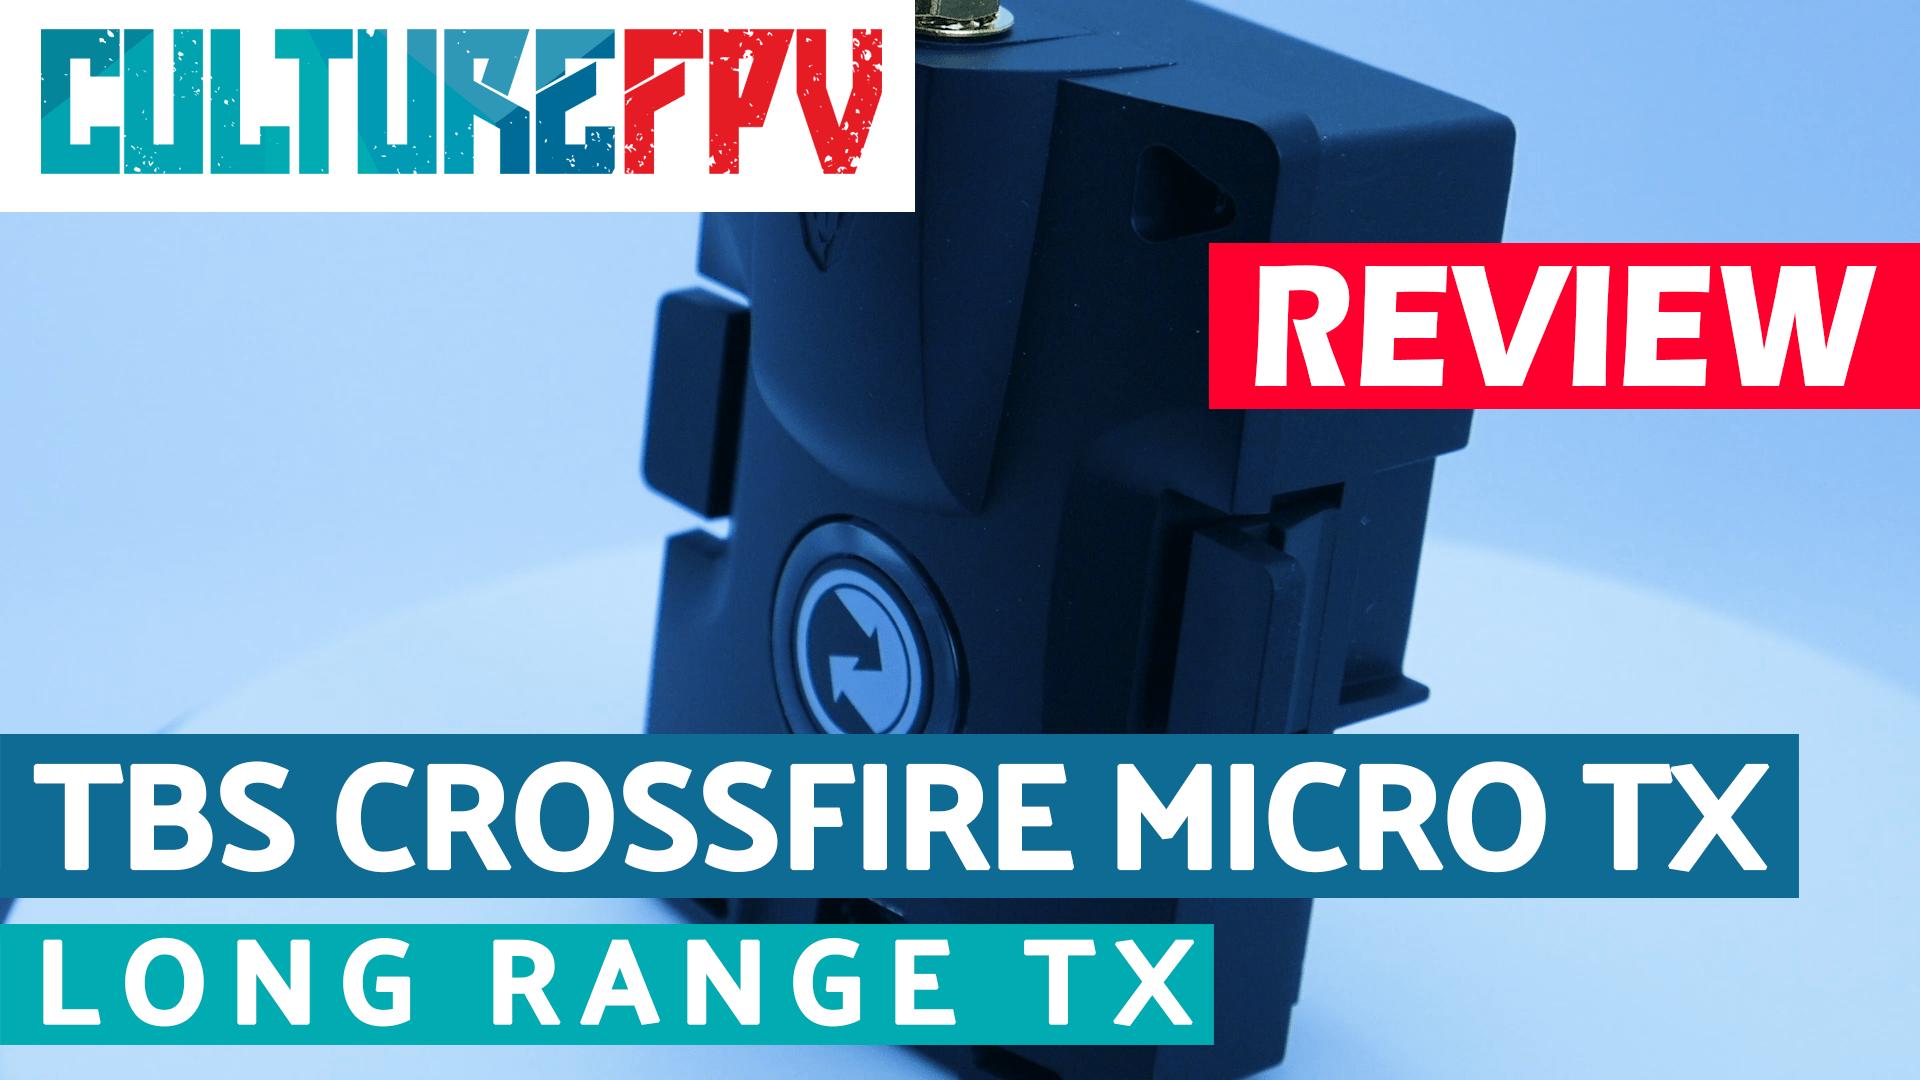 TBS Crossfire micro TX